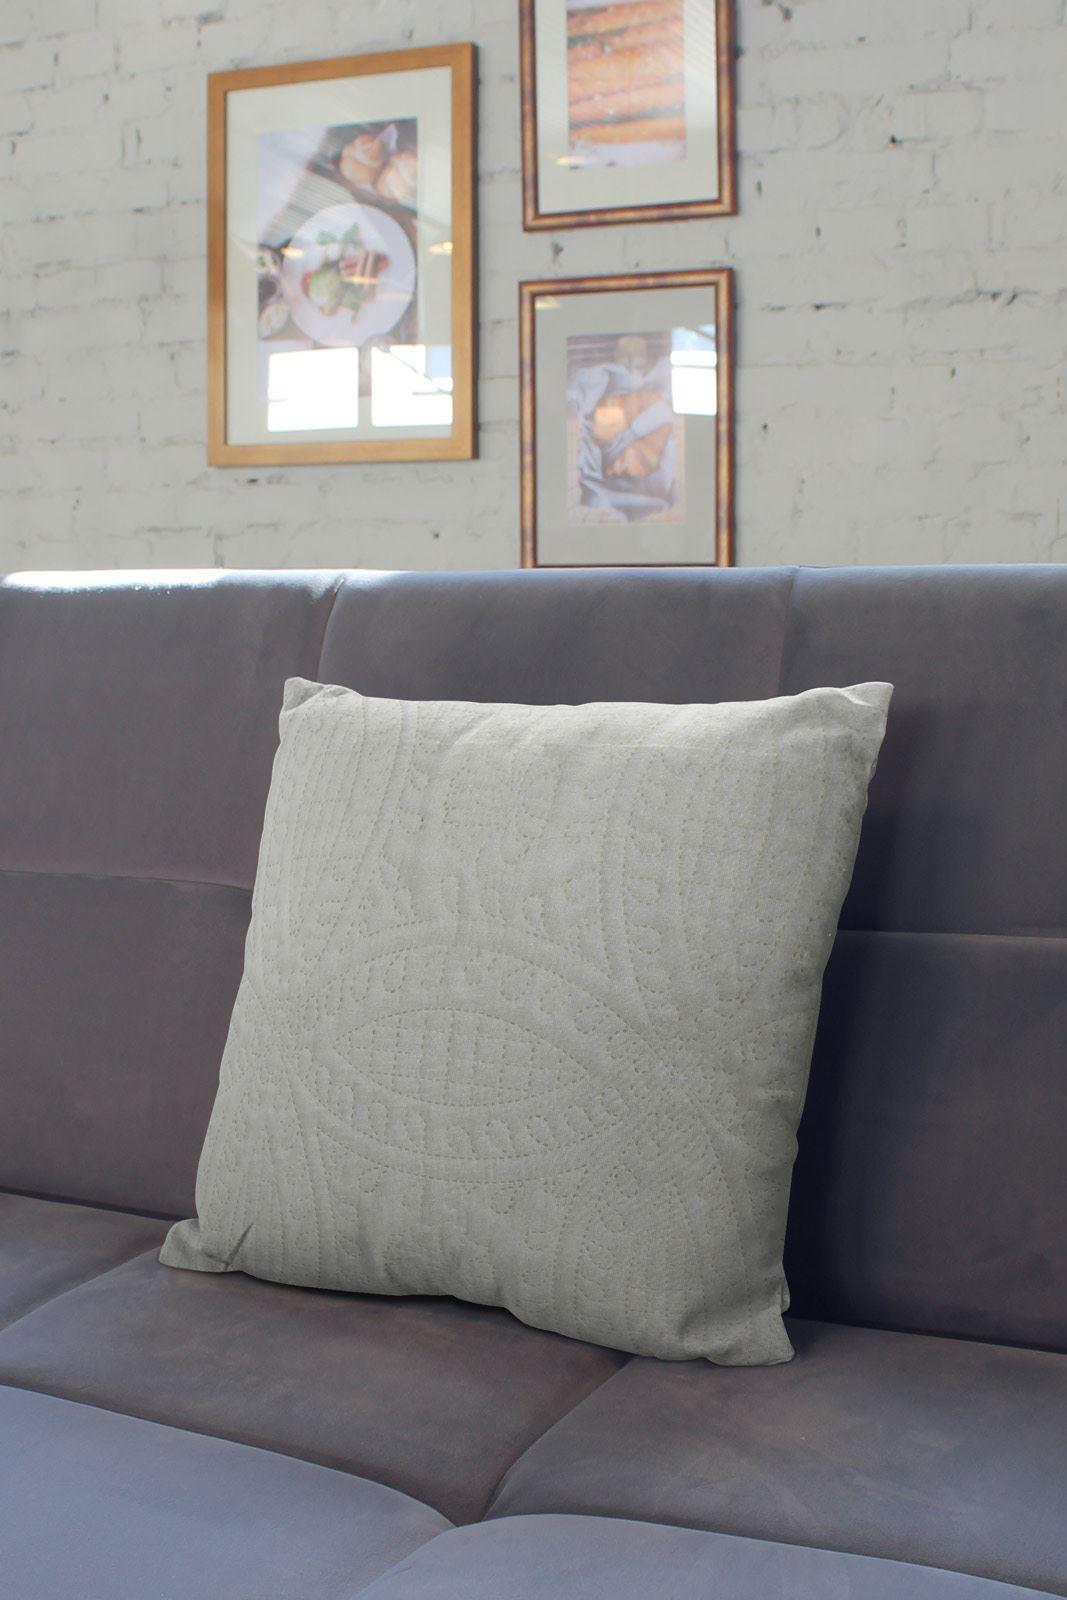 Crema-Color-Foglia-Di-Te-Blu-Uovo-D-039-anatra-Cuscino-Copre-18-034-x-18-034-45-CM-x-45-cm-COVER miniatura 31